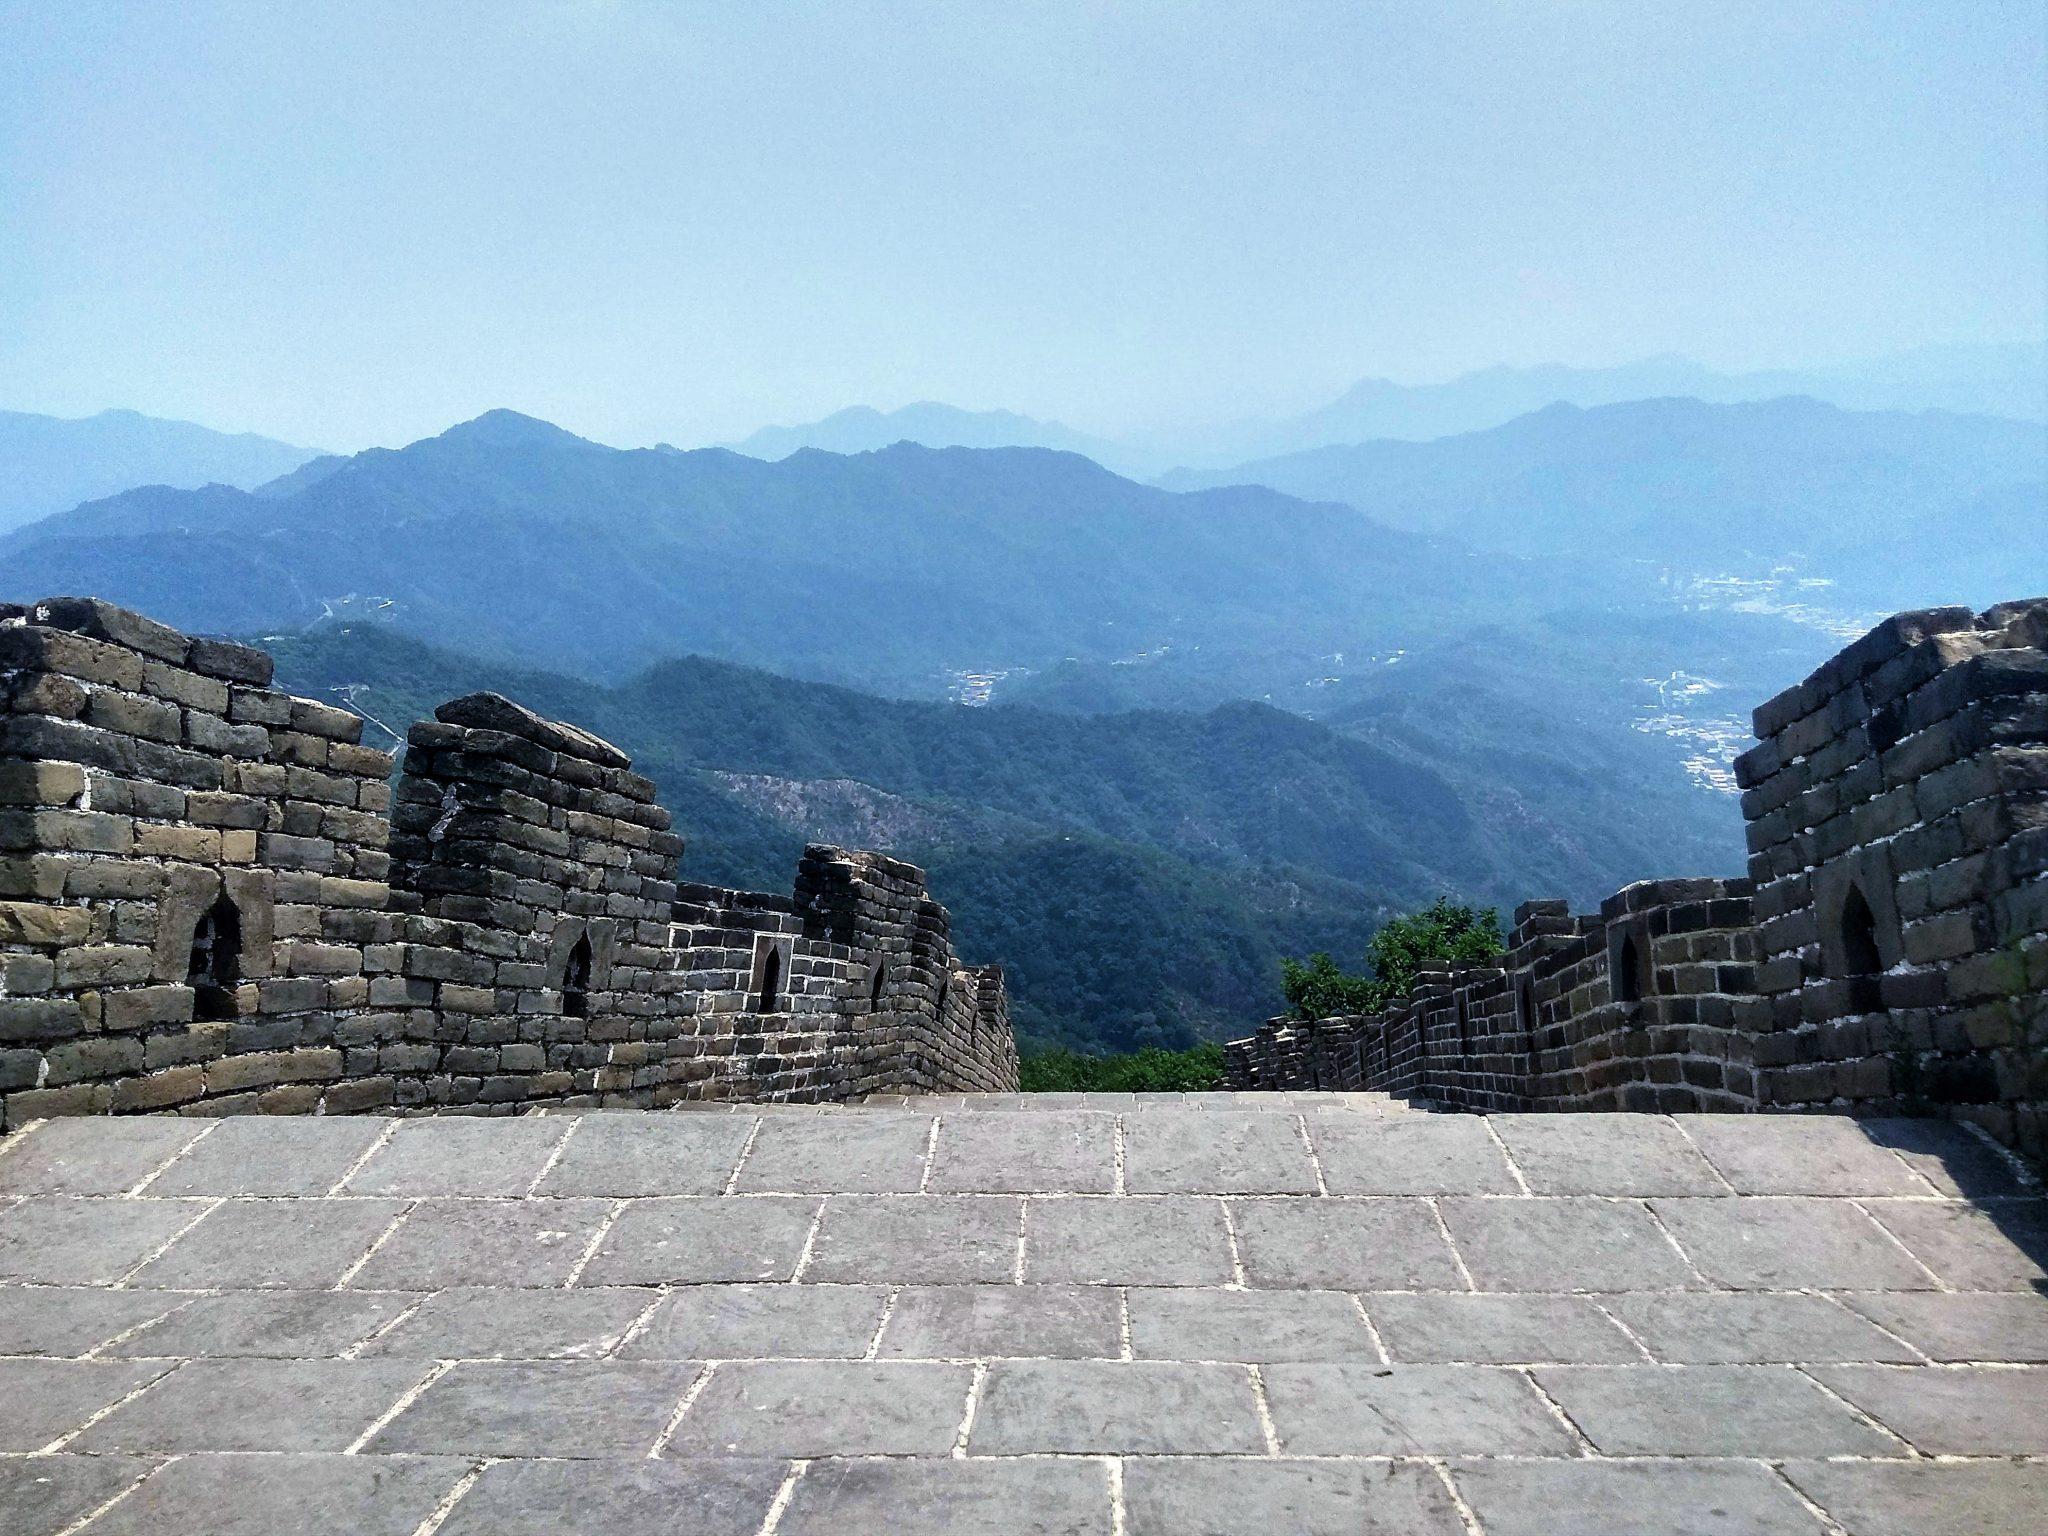 Muralla China. Post que parte ver de la muralla china - Pasaporte y Millas